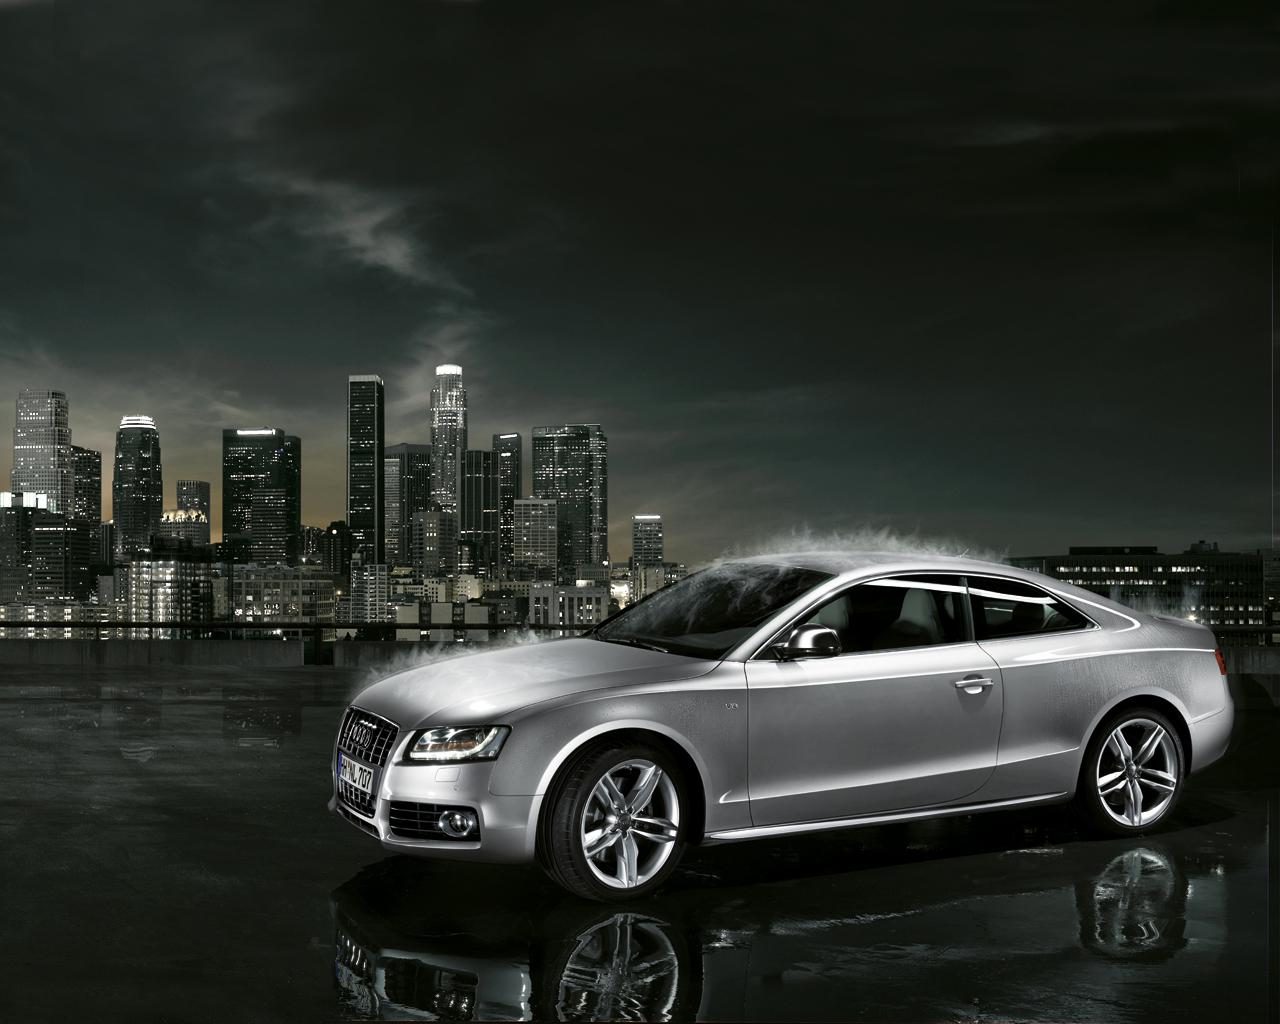 Full Wallpaper Fond D Ecran Voitures Audi S5 A5 Image